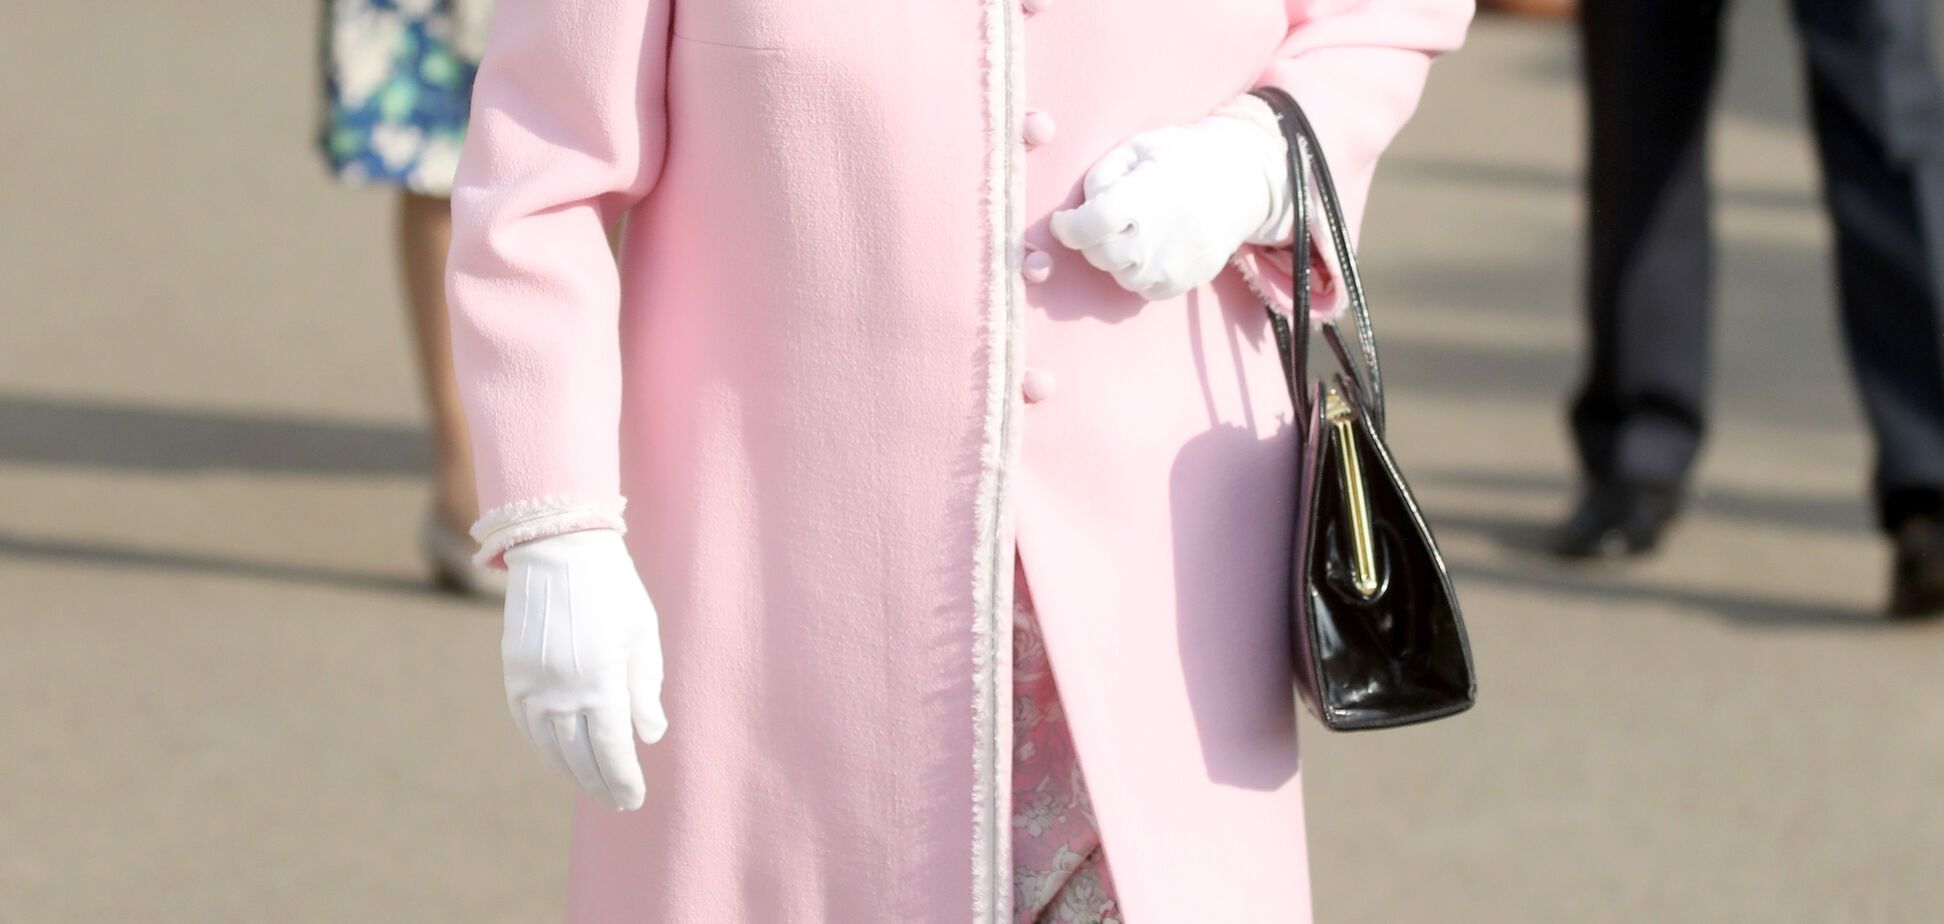 Красивее, чем на свадьбе принца Гарри: Елизавета II восхитила нежным образом